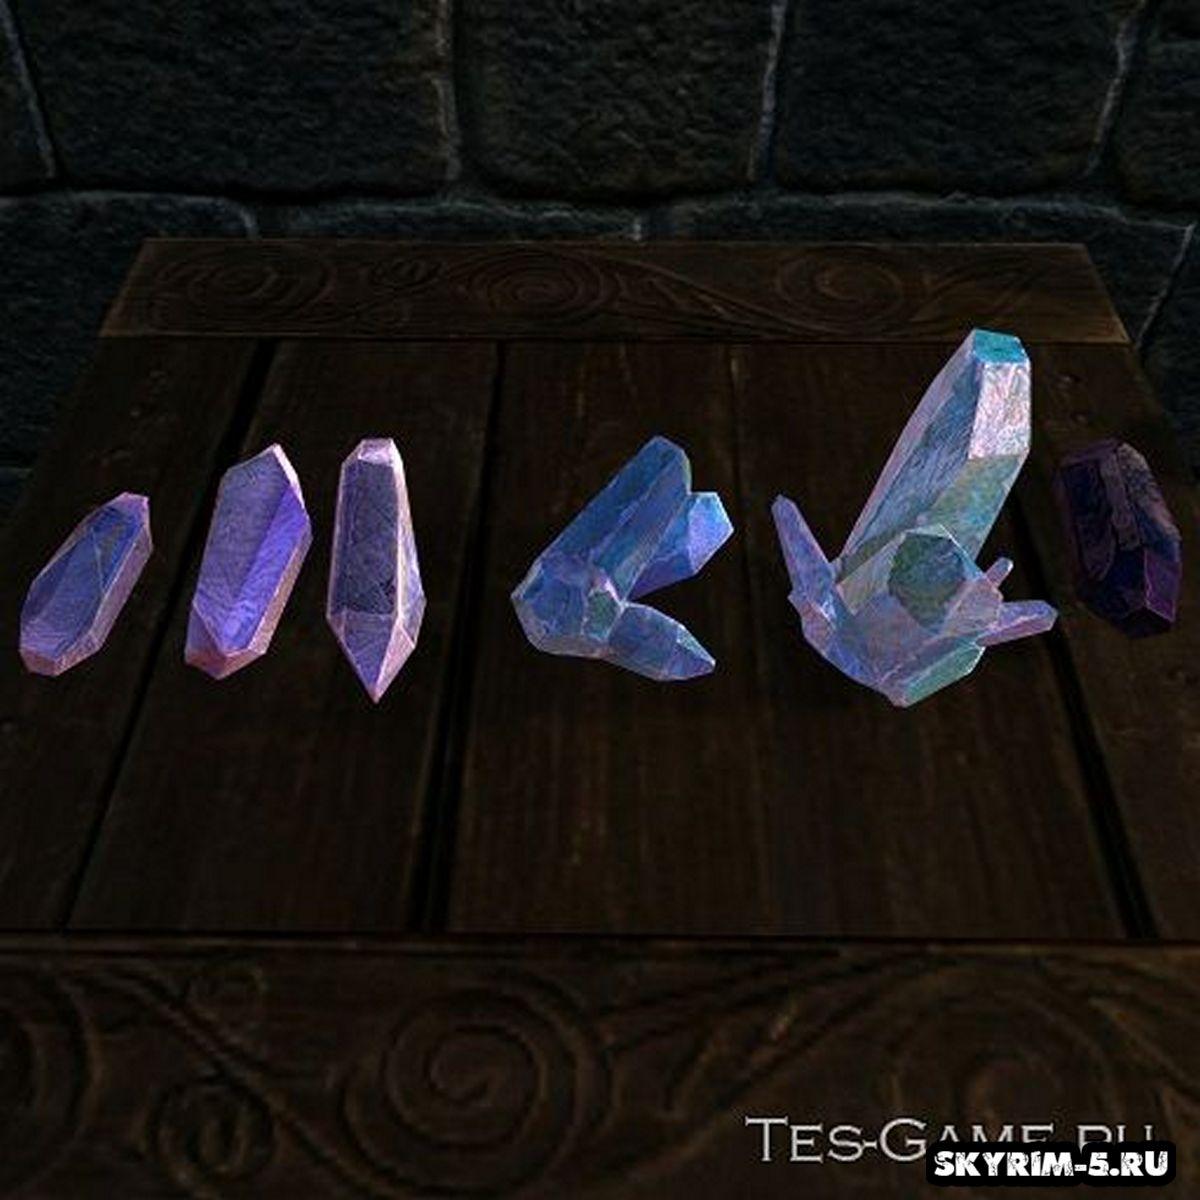 Rustic soul gems mod for skyrim